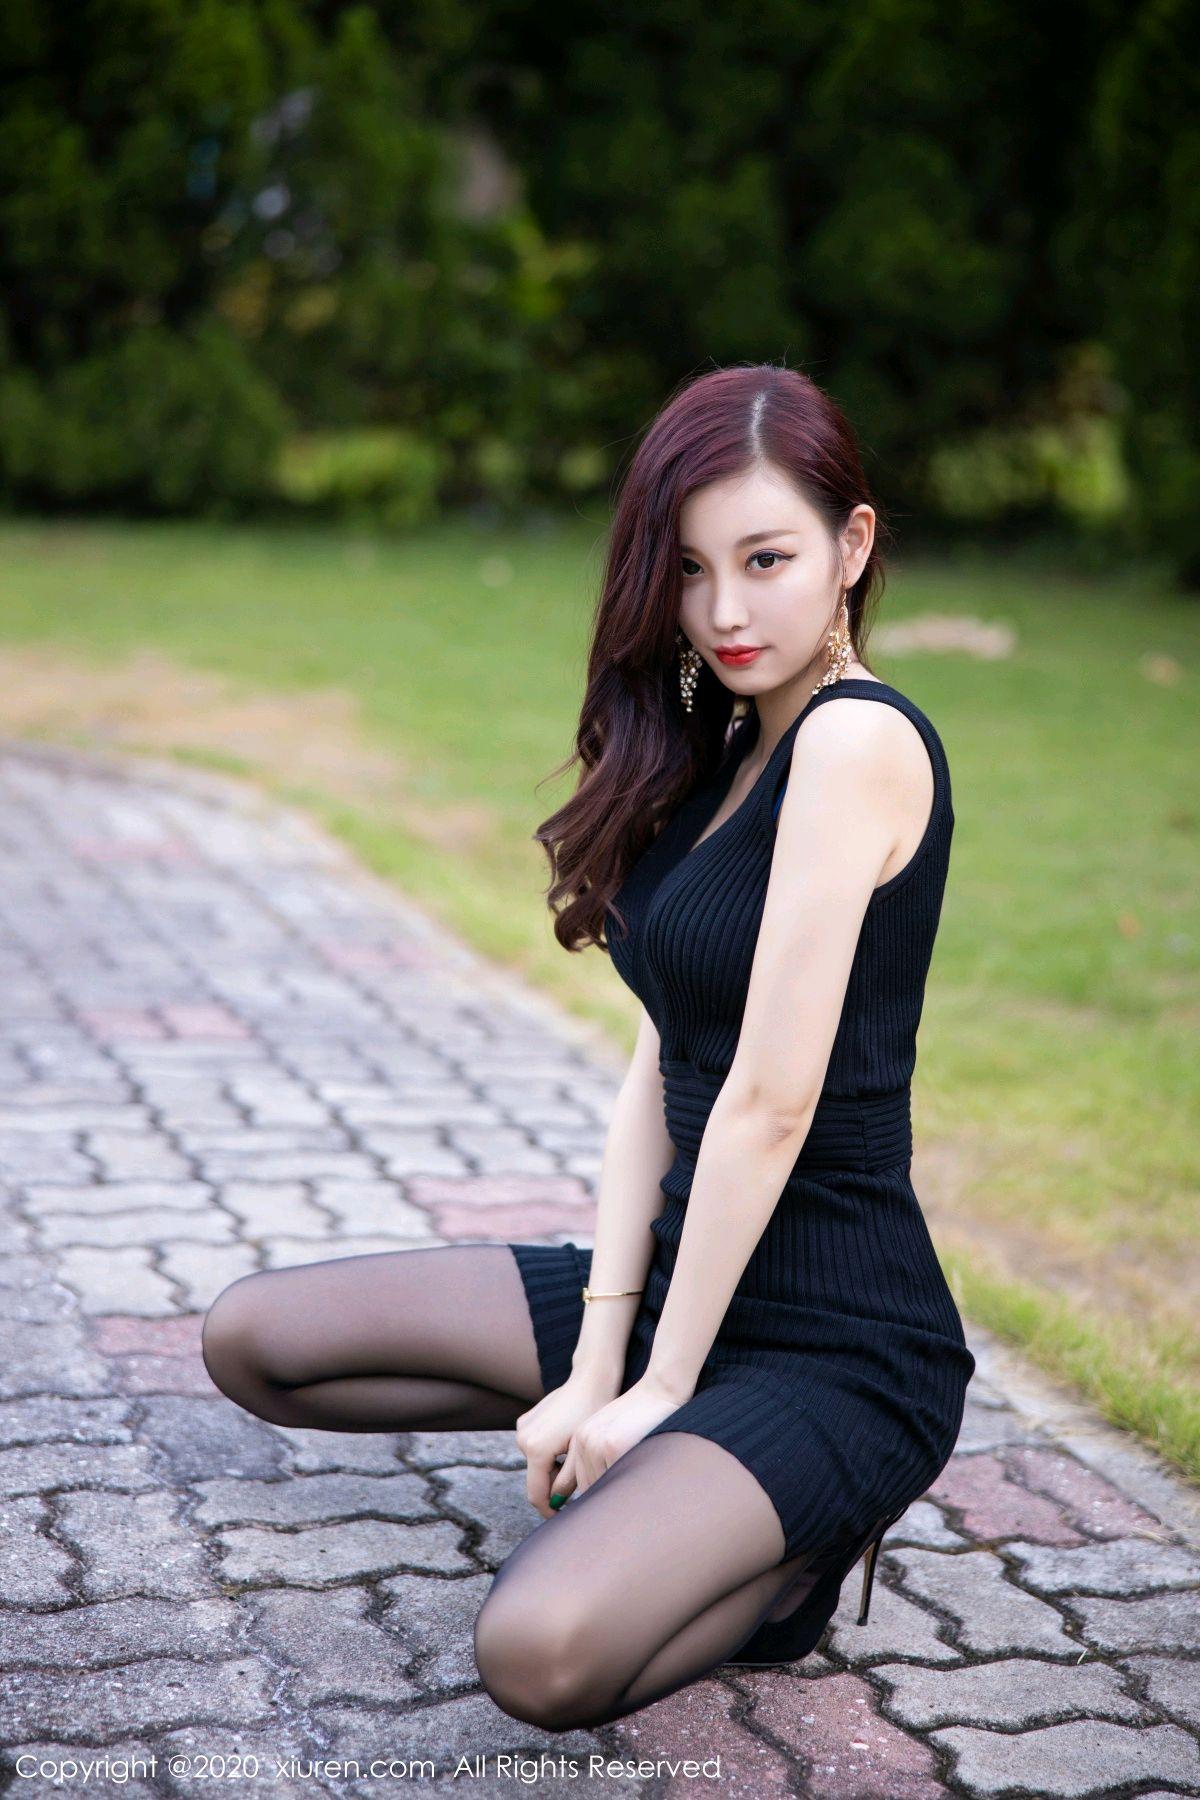 [XiuRen] Vol.2648 Yang Chen Chen 11P, Black Silk, Outdoor, Xiuren, Yang Chen Chen